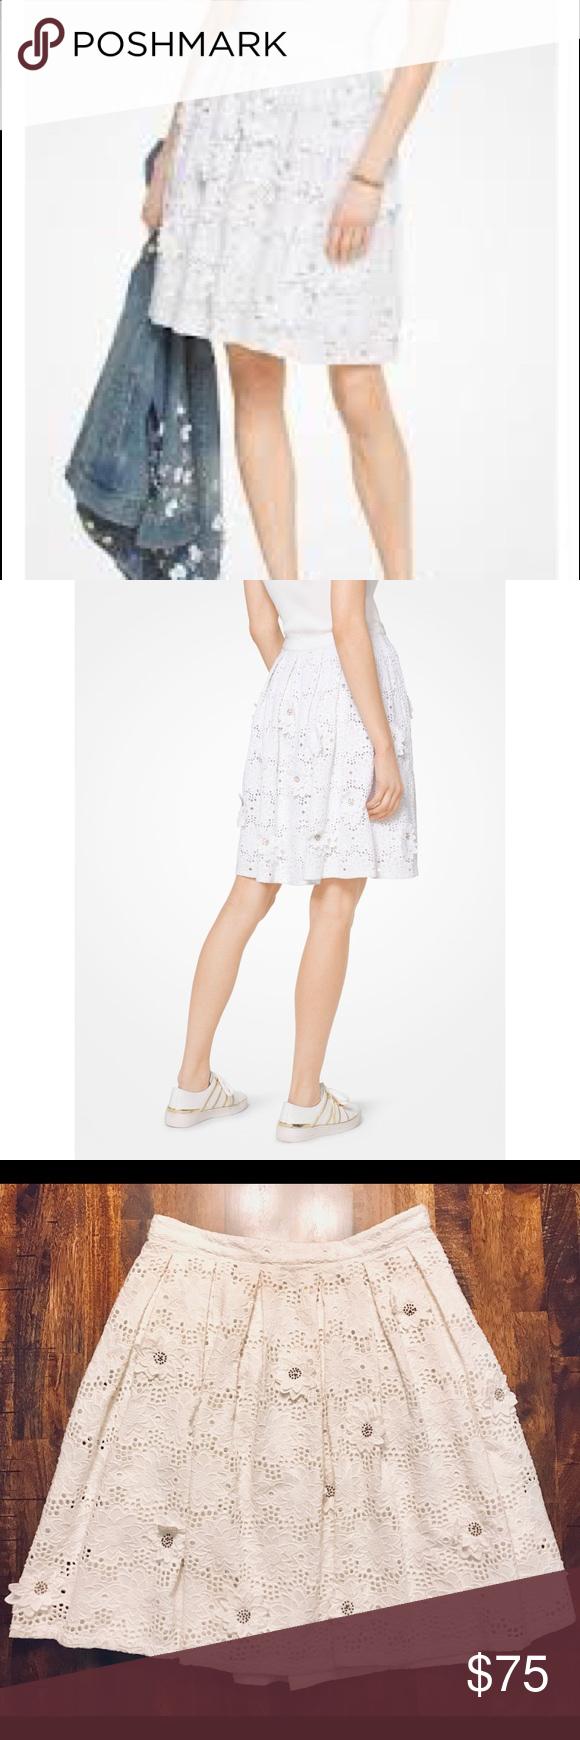 Michael Kors Floral Appliqué Eyelet Skirt Fashion